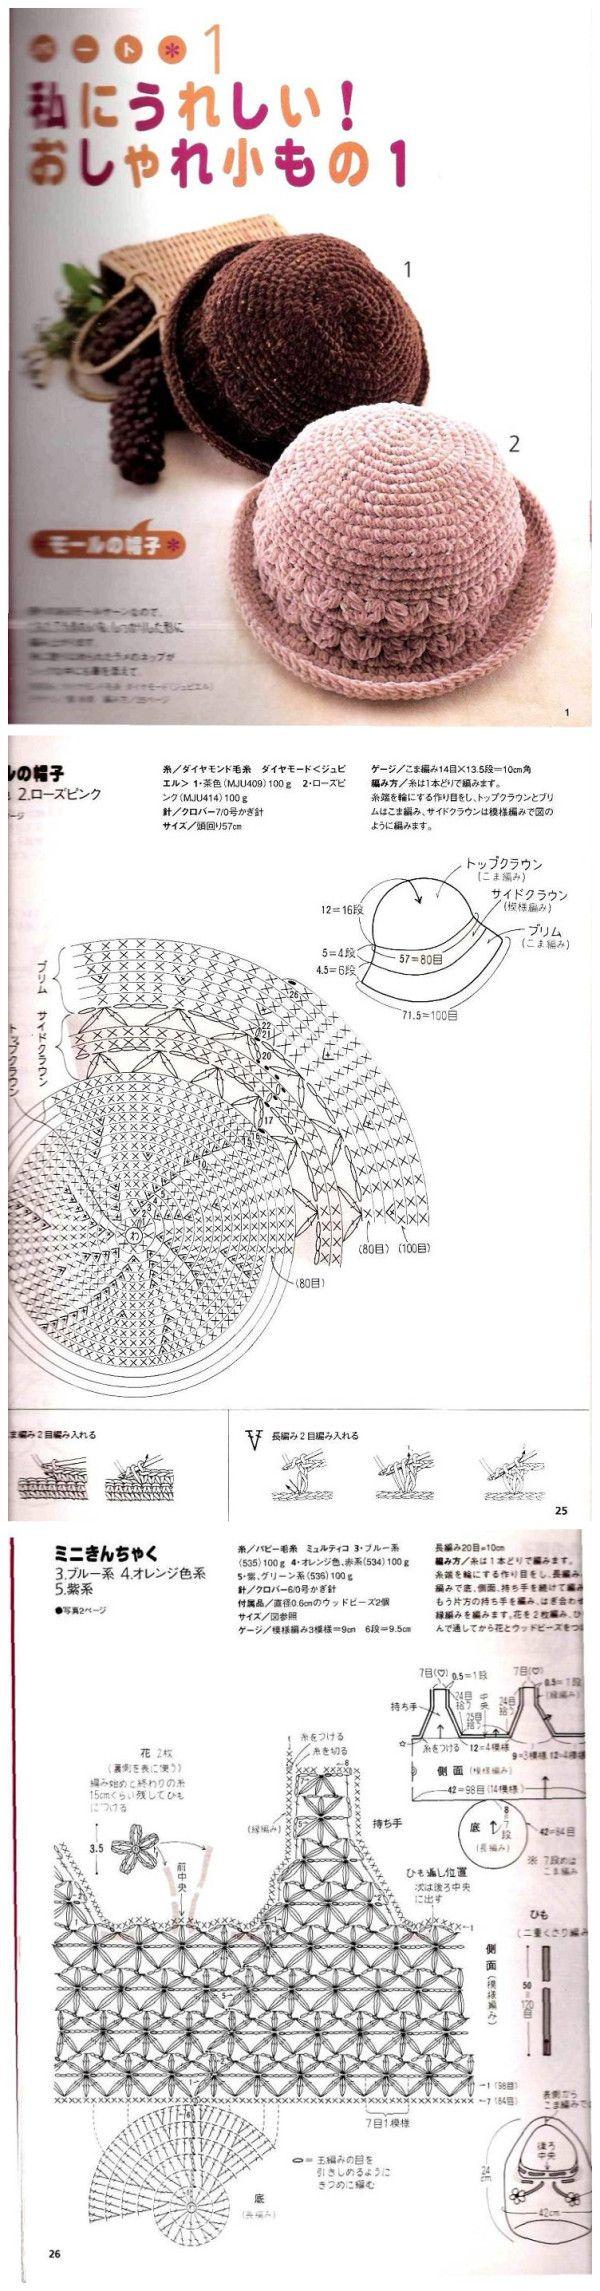 102 best sombreritos crochet images on Pinterest | Turbans, Knit ...